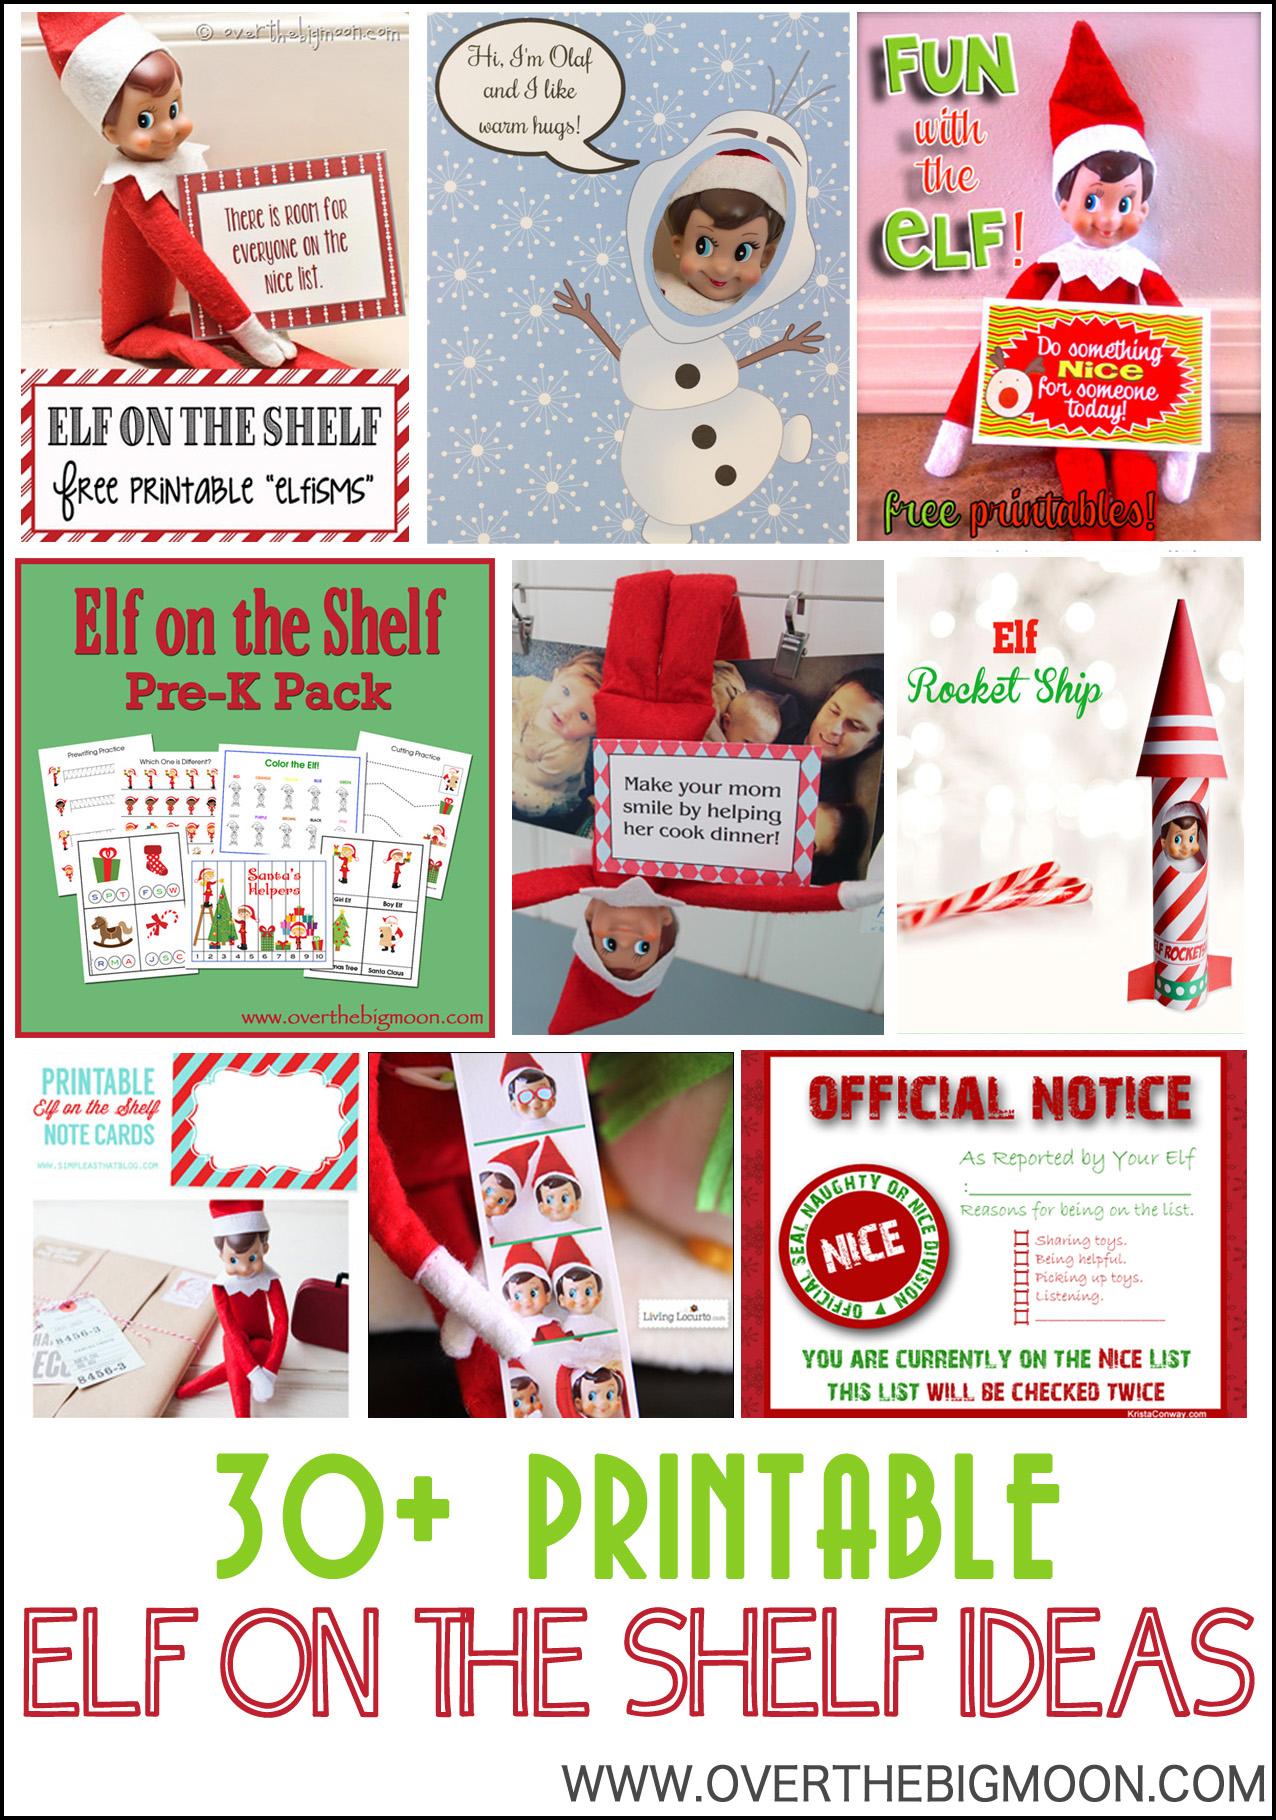 30+ Printable Elf On The Shelf Ideas - Over The Big Moon - Elf On The Shelf Printable Props Free